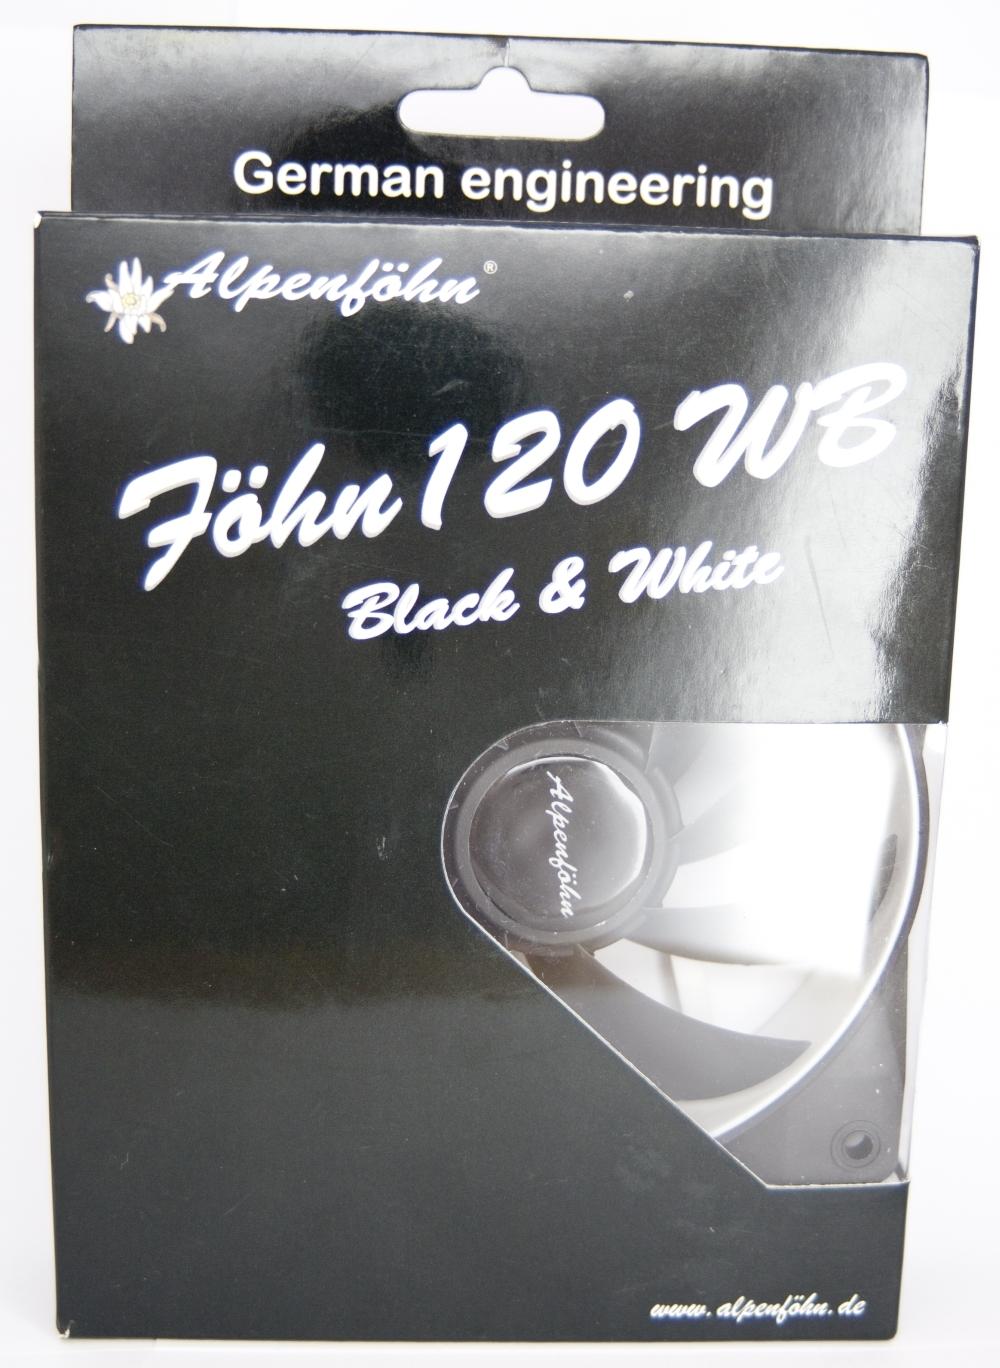 Alpenfohn Packaging